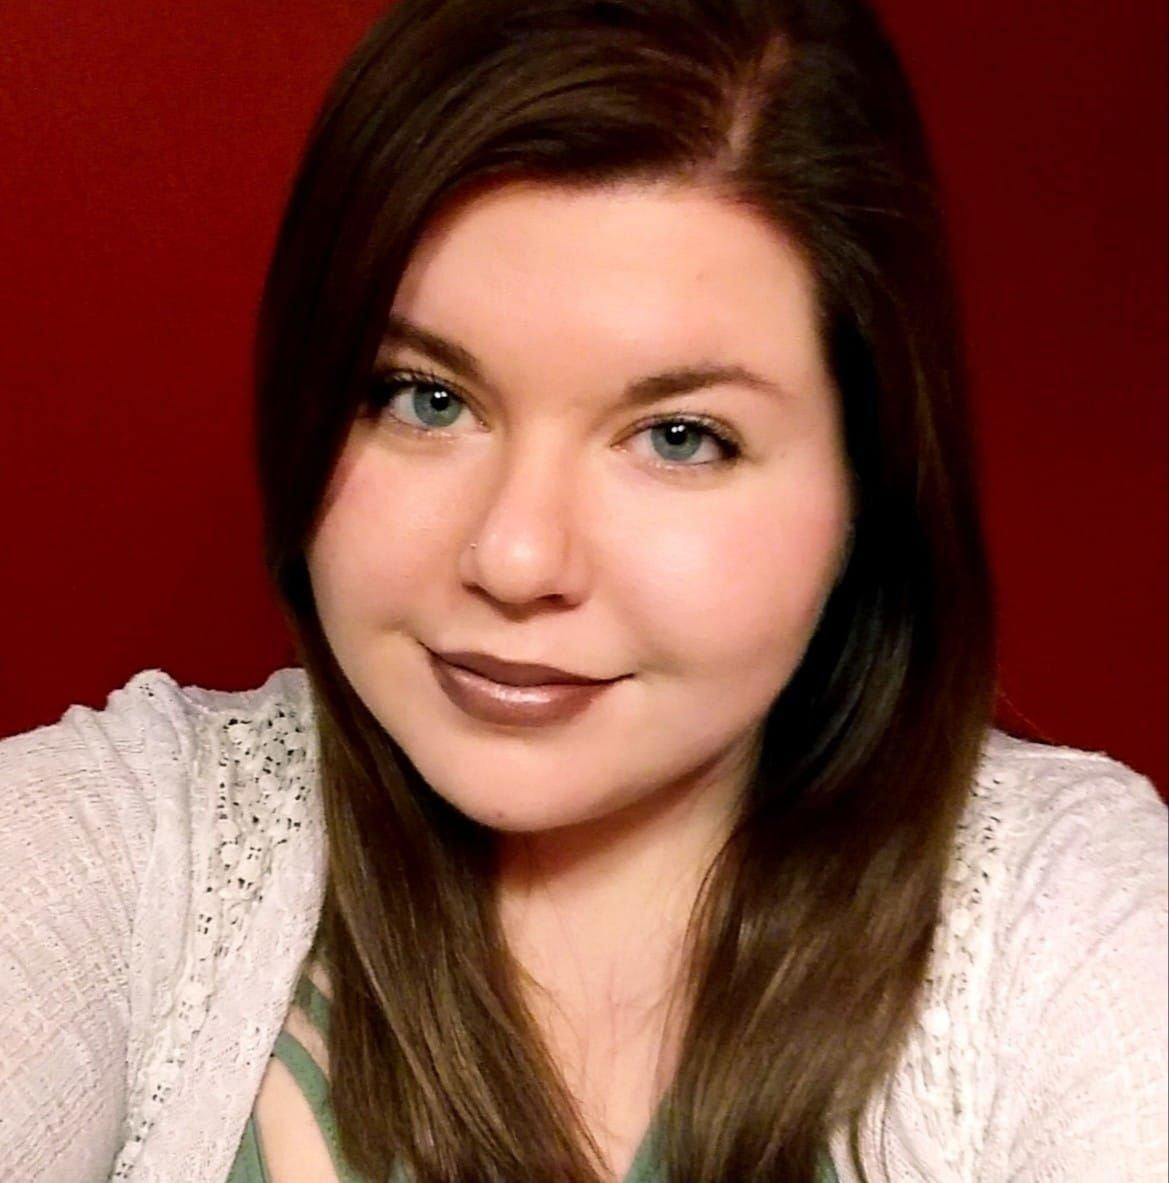 Erin Pilarski